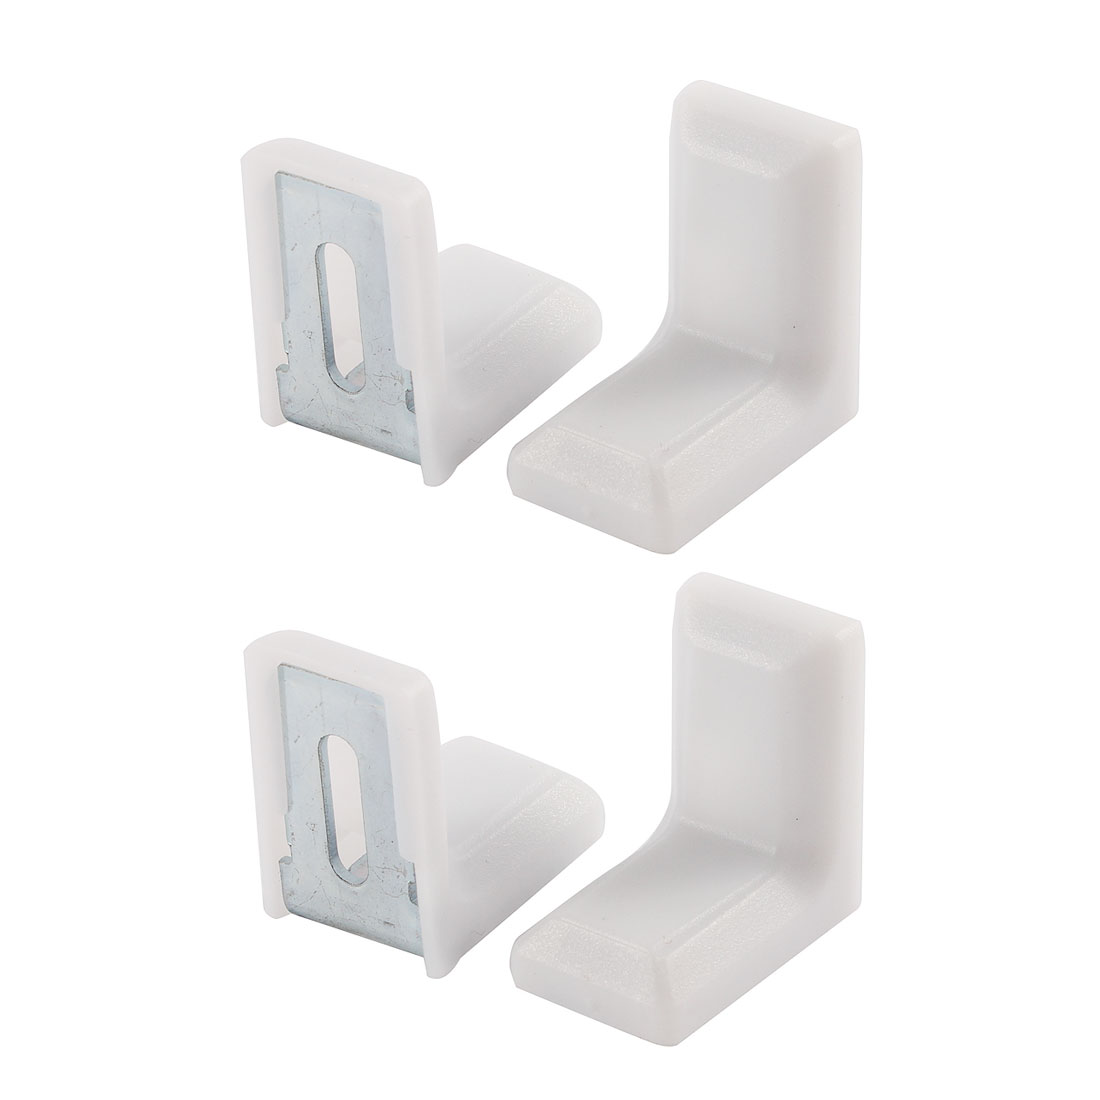 28mmx28mmx19mm Metal Plastic Furniture Cabinet L Angle Bracket White 4Pcs